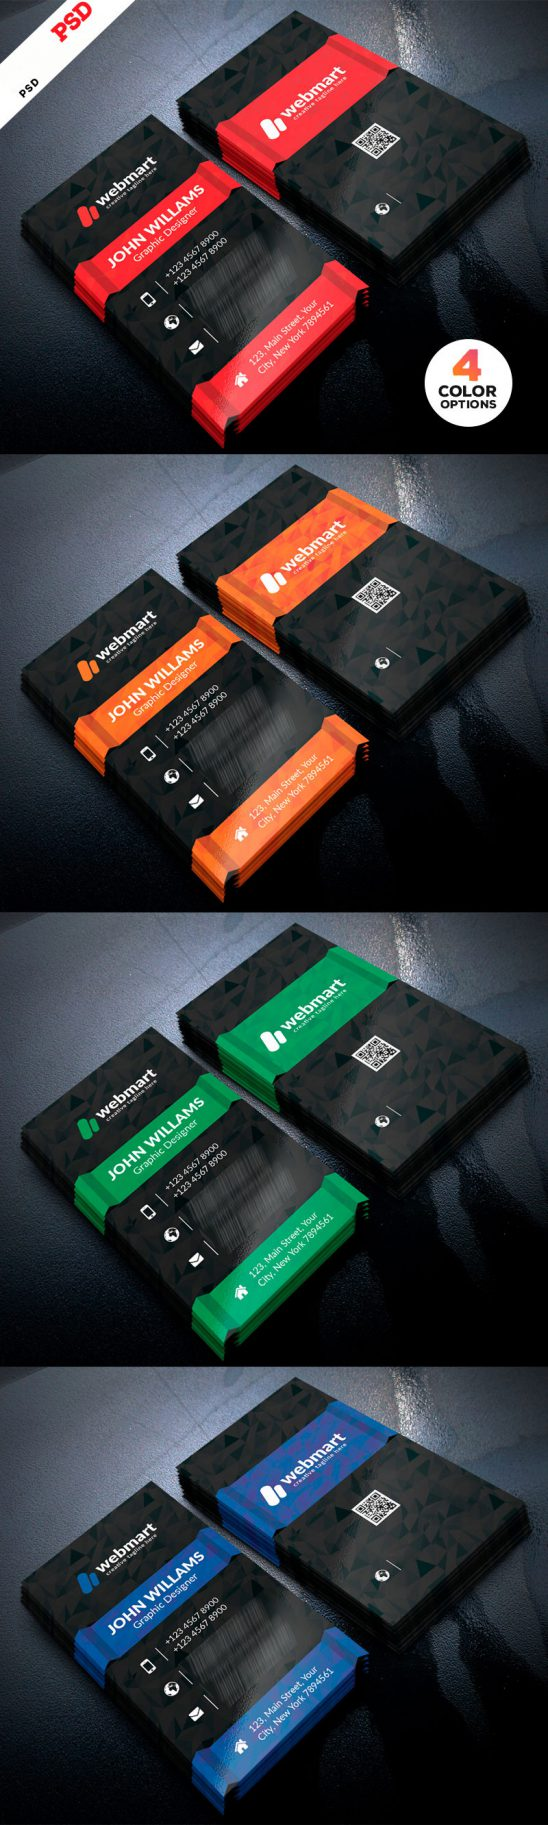 p683 548x1825 - کارت ویزیت لایه باز تجاری اداری با قابلیت درج عکس پرسنلی و qrcod